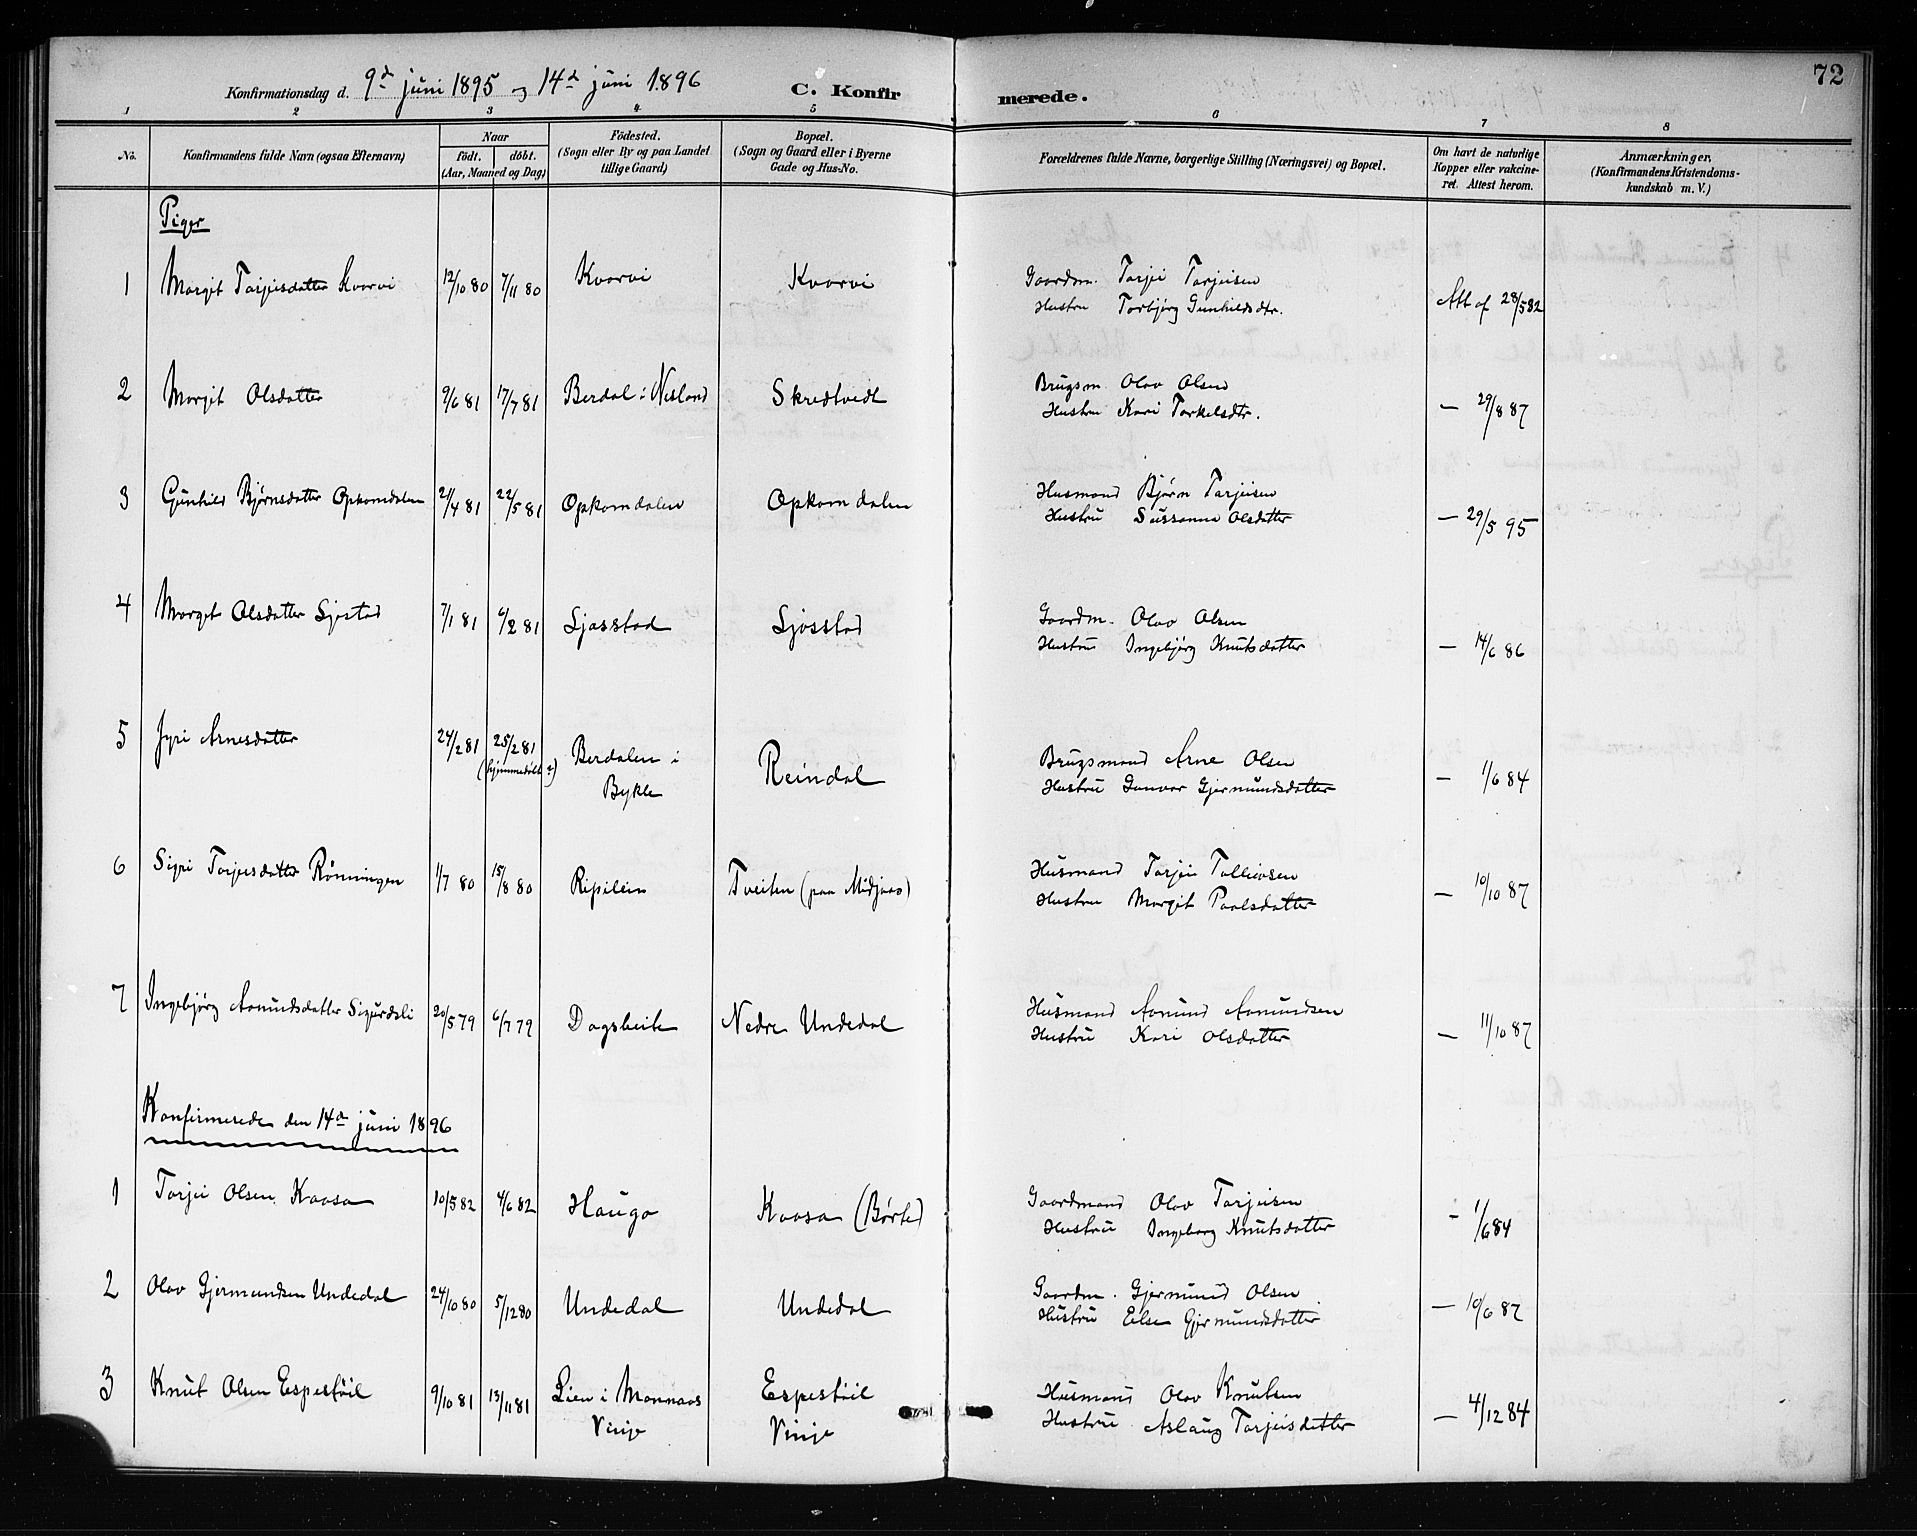 SAKO, Mo kirkebøker, G/Ga/L0002: Klokkerbok nr. I 2, 1892-1914, s. 72